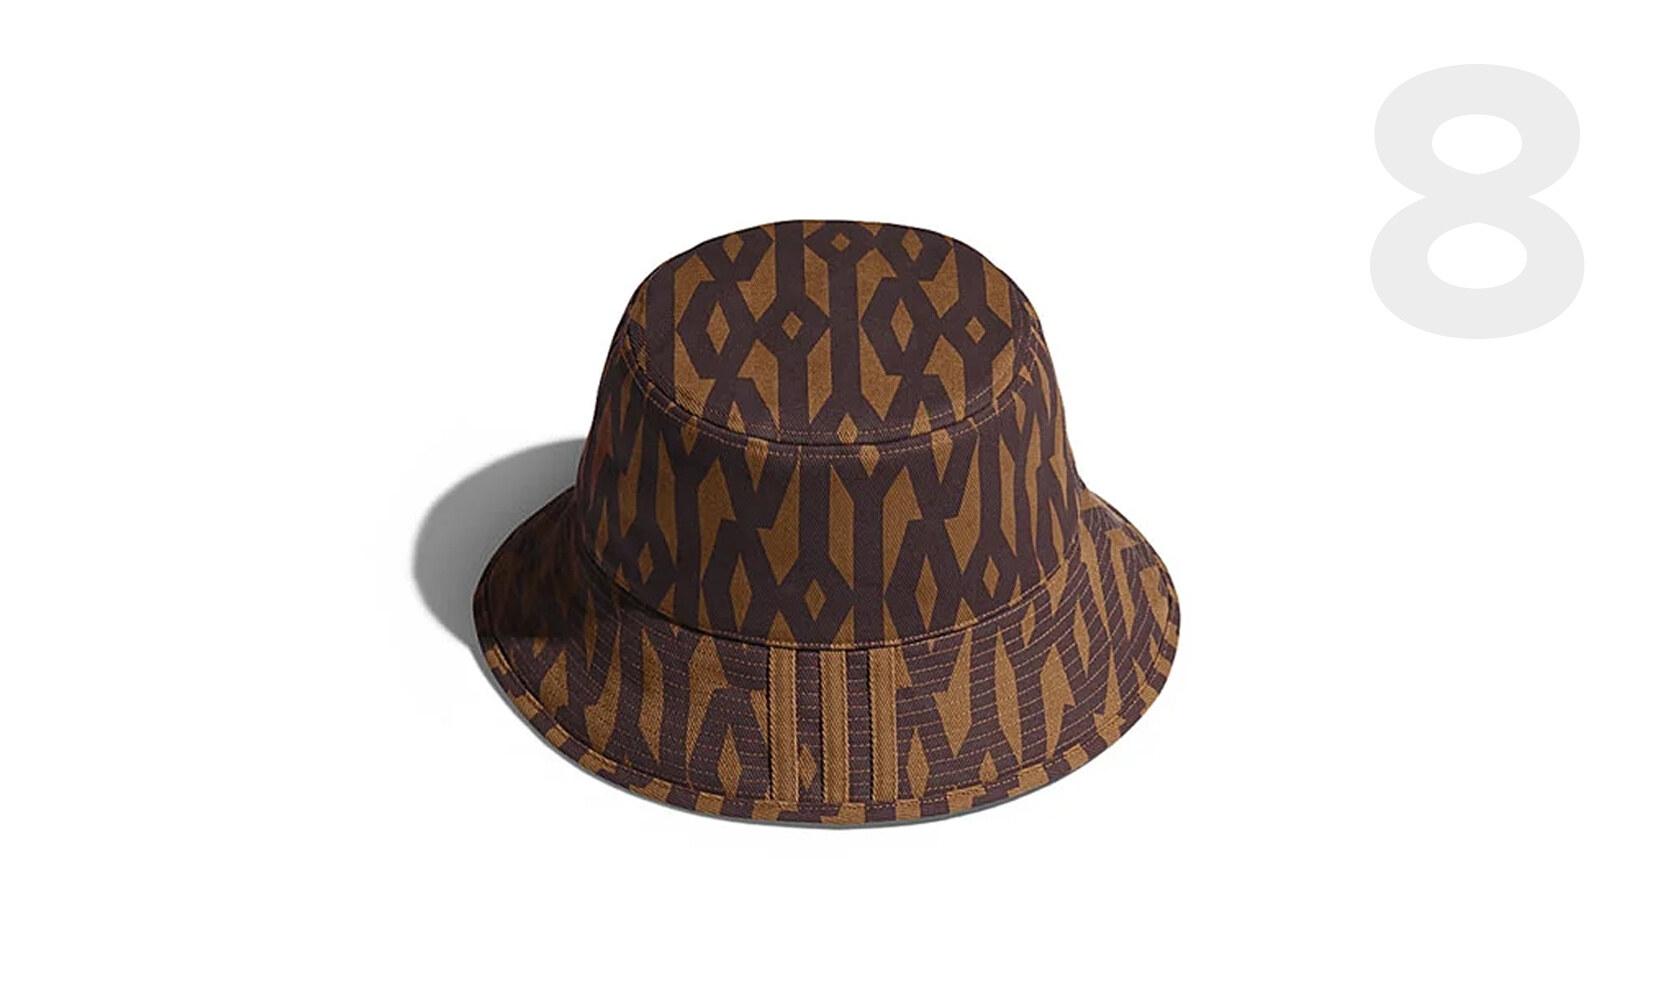 Adidas x Ivy Park monogram bucket hat